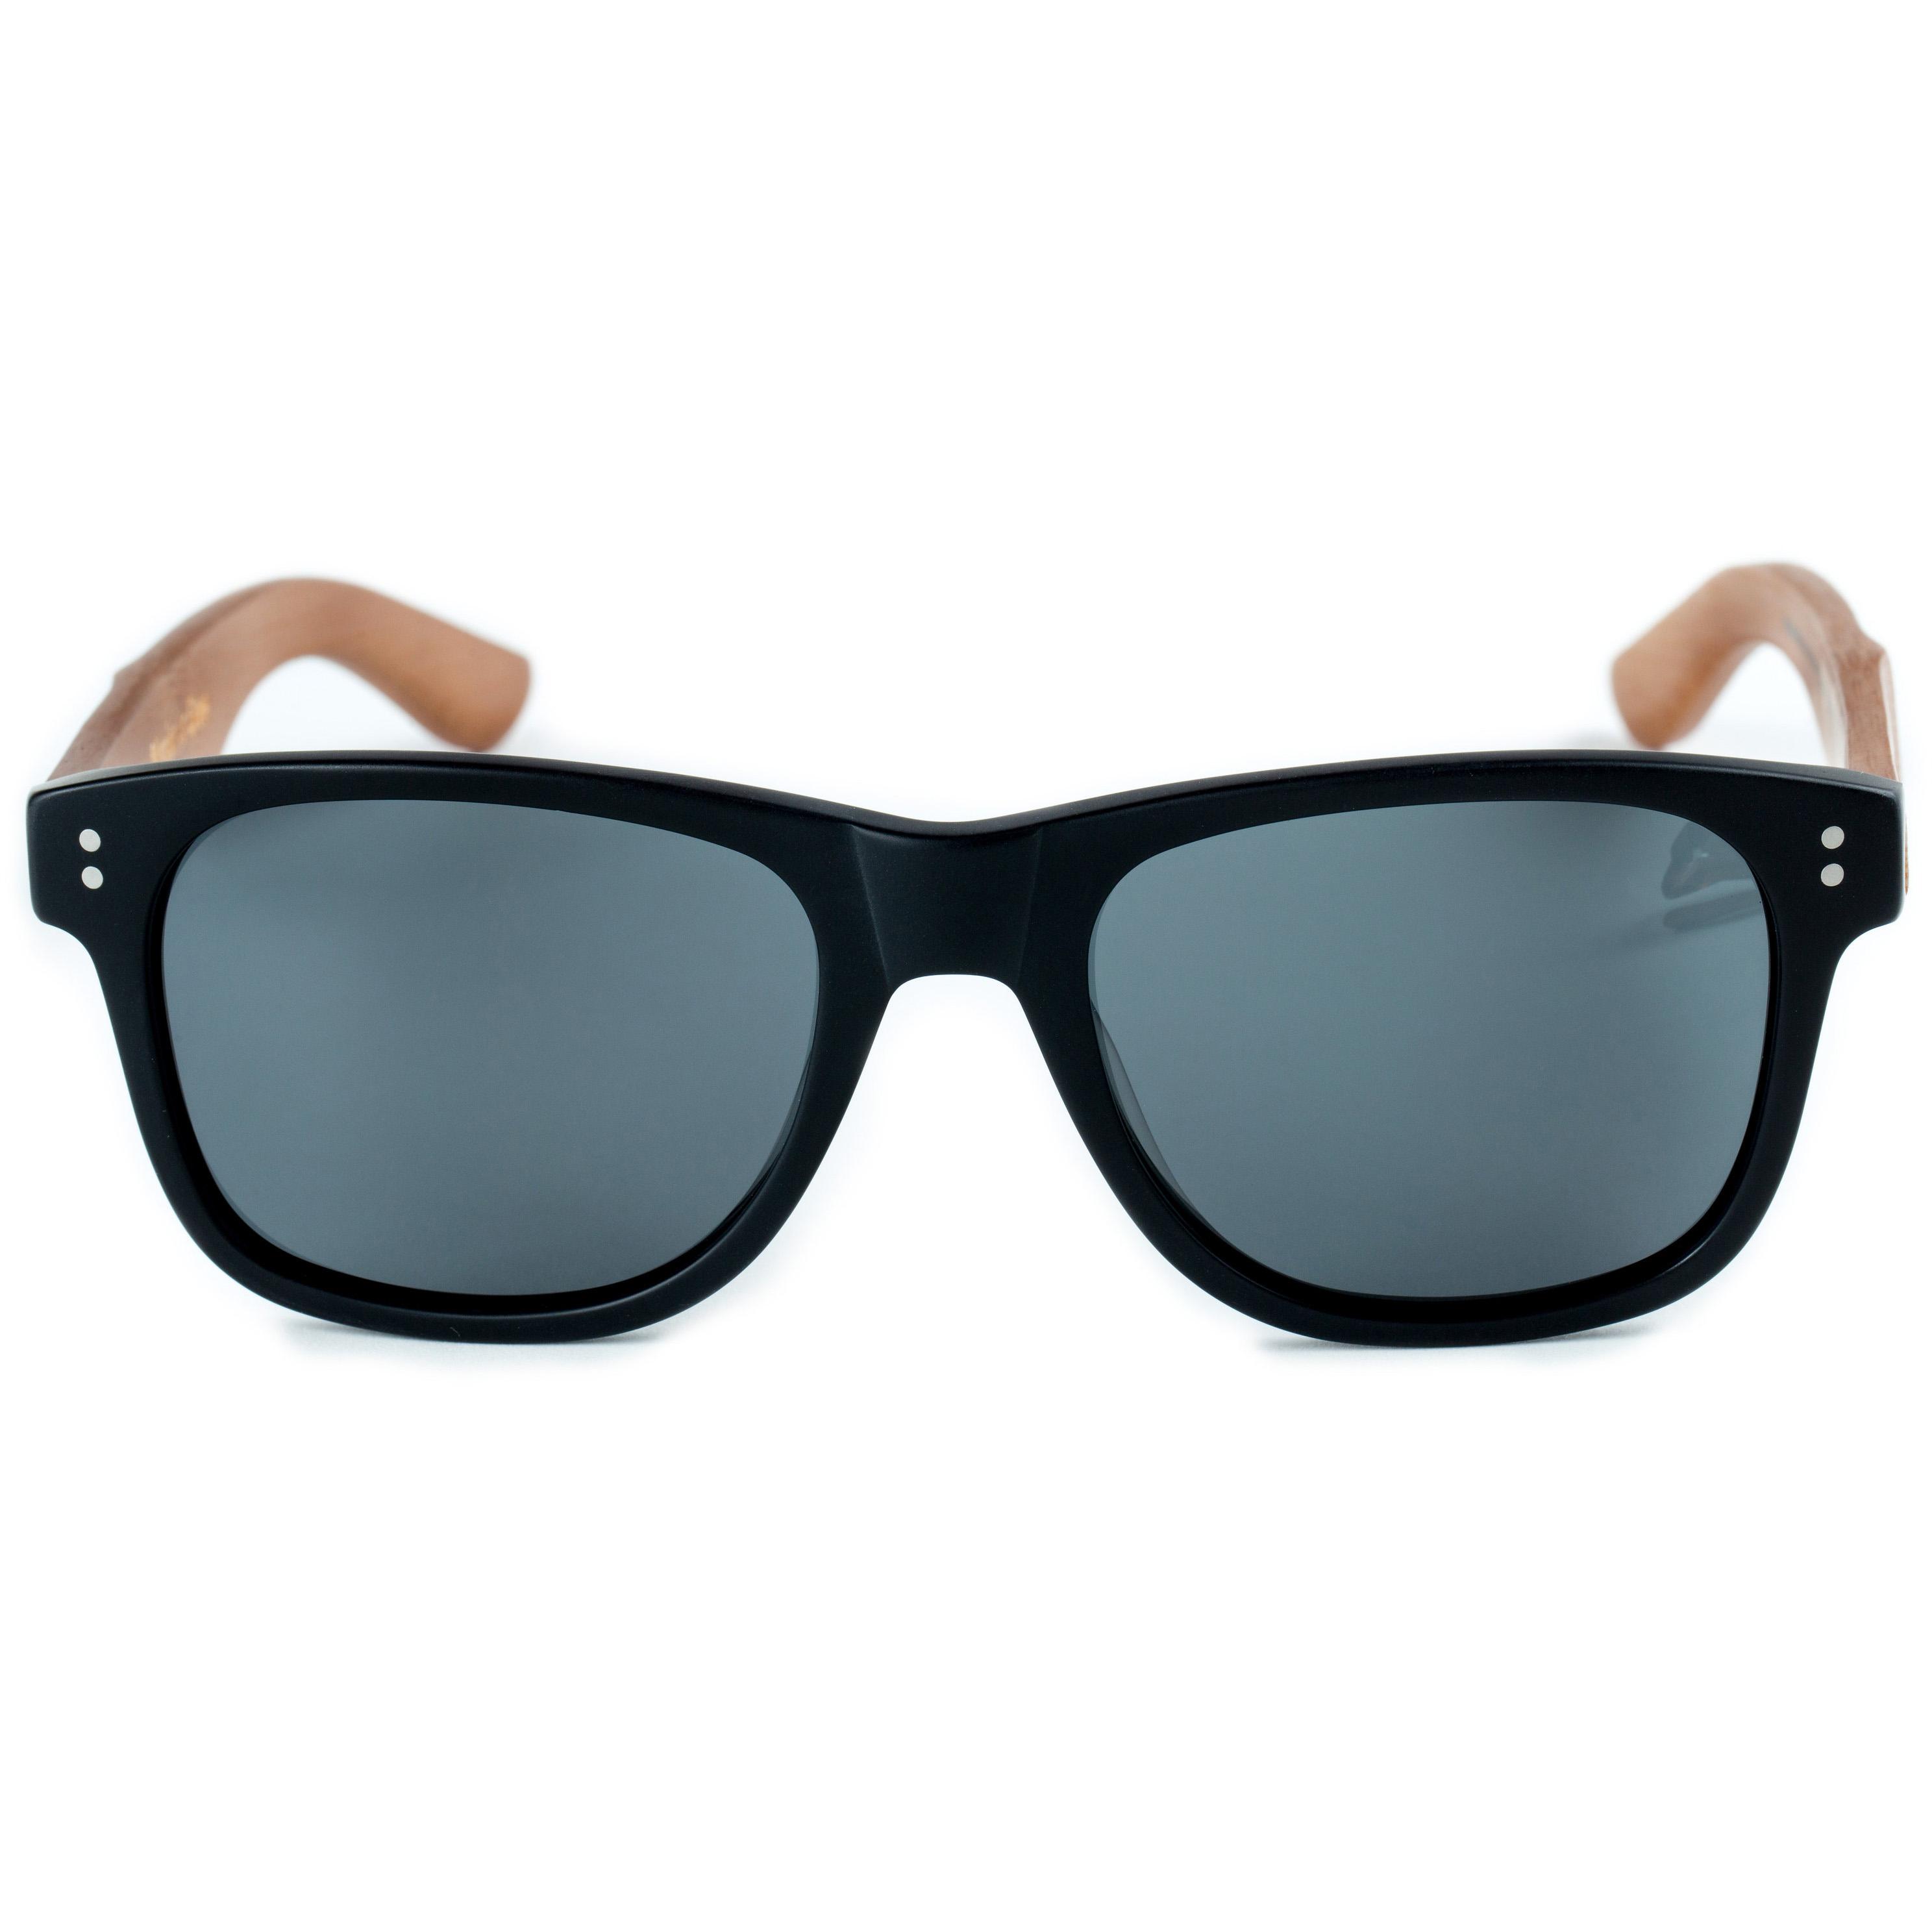 EarthHero - Dominican Polarized Sunglasses 3